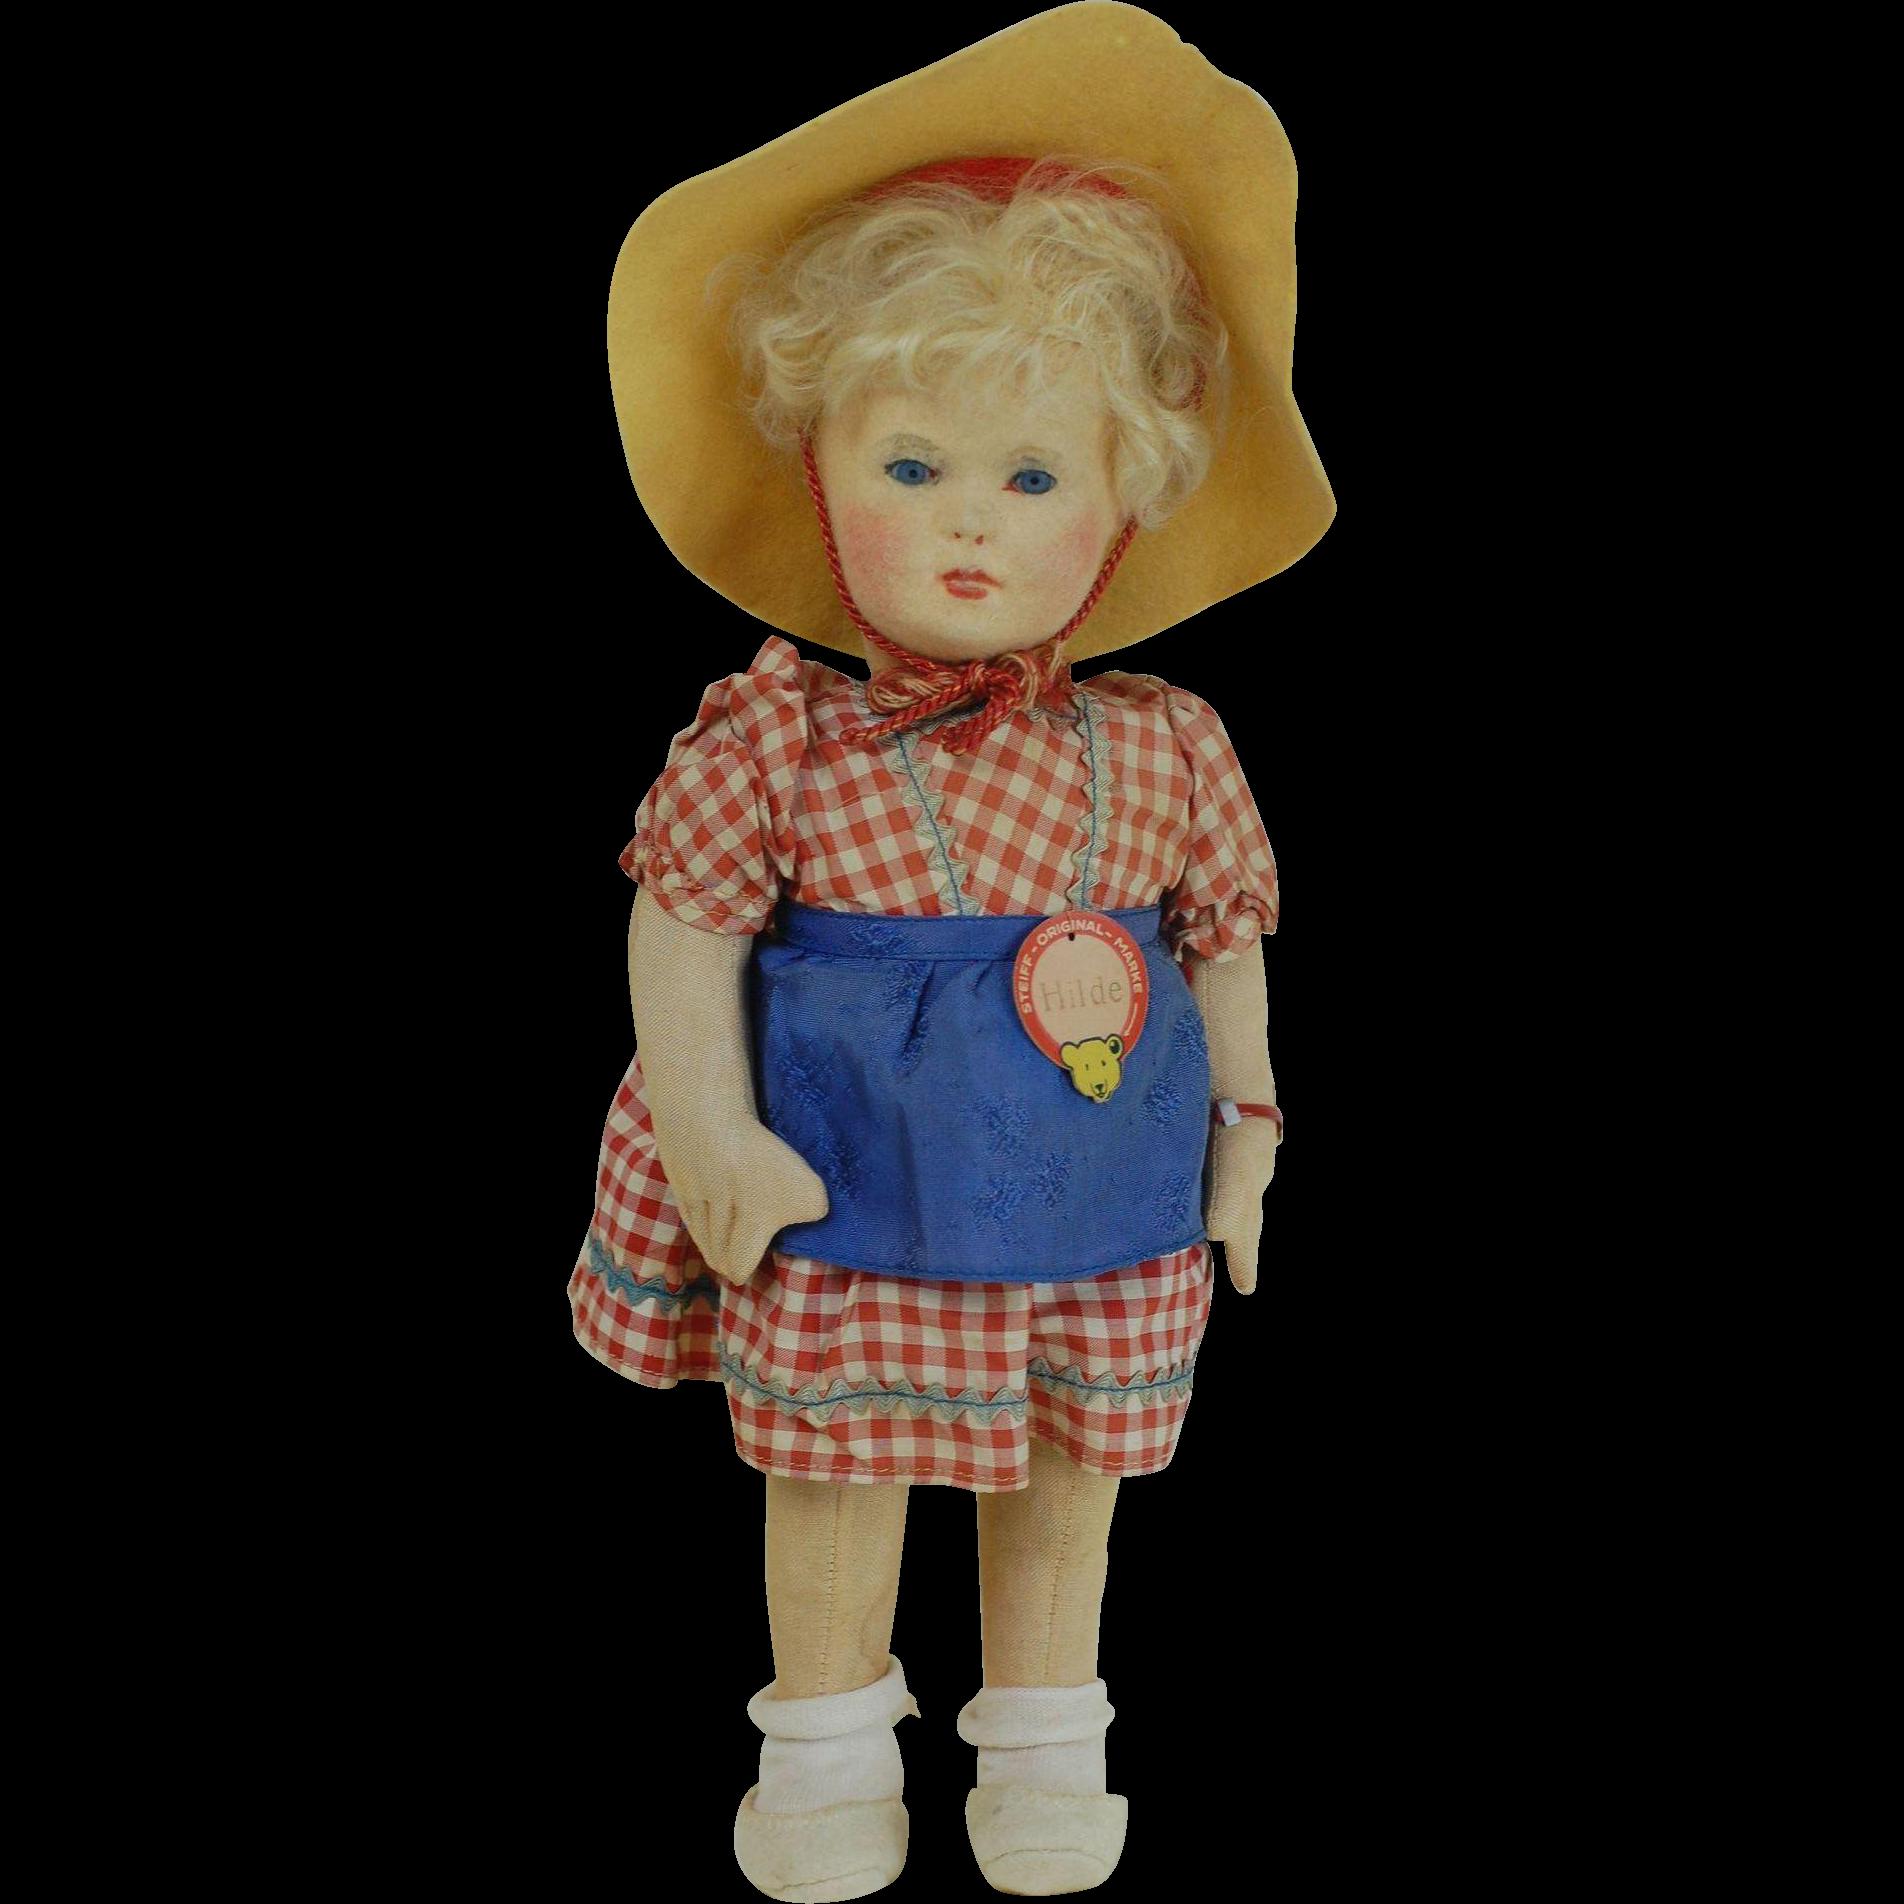 Rare near Mint Steiff Hilde Doll All ID 1939 Steiff